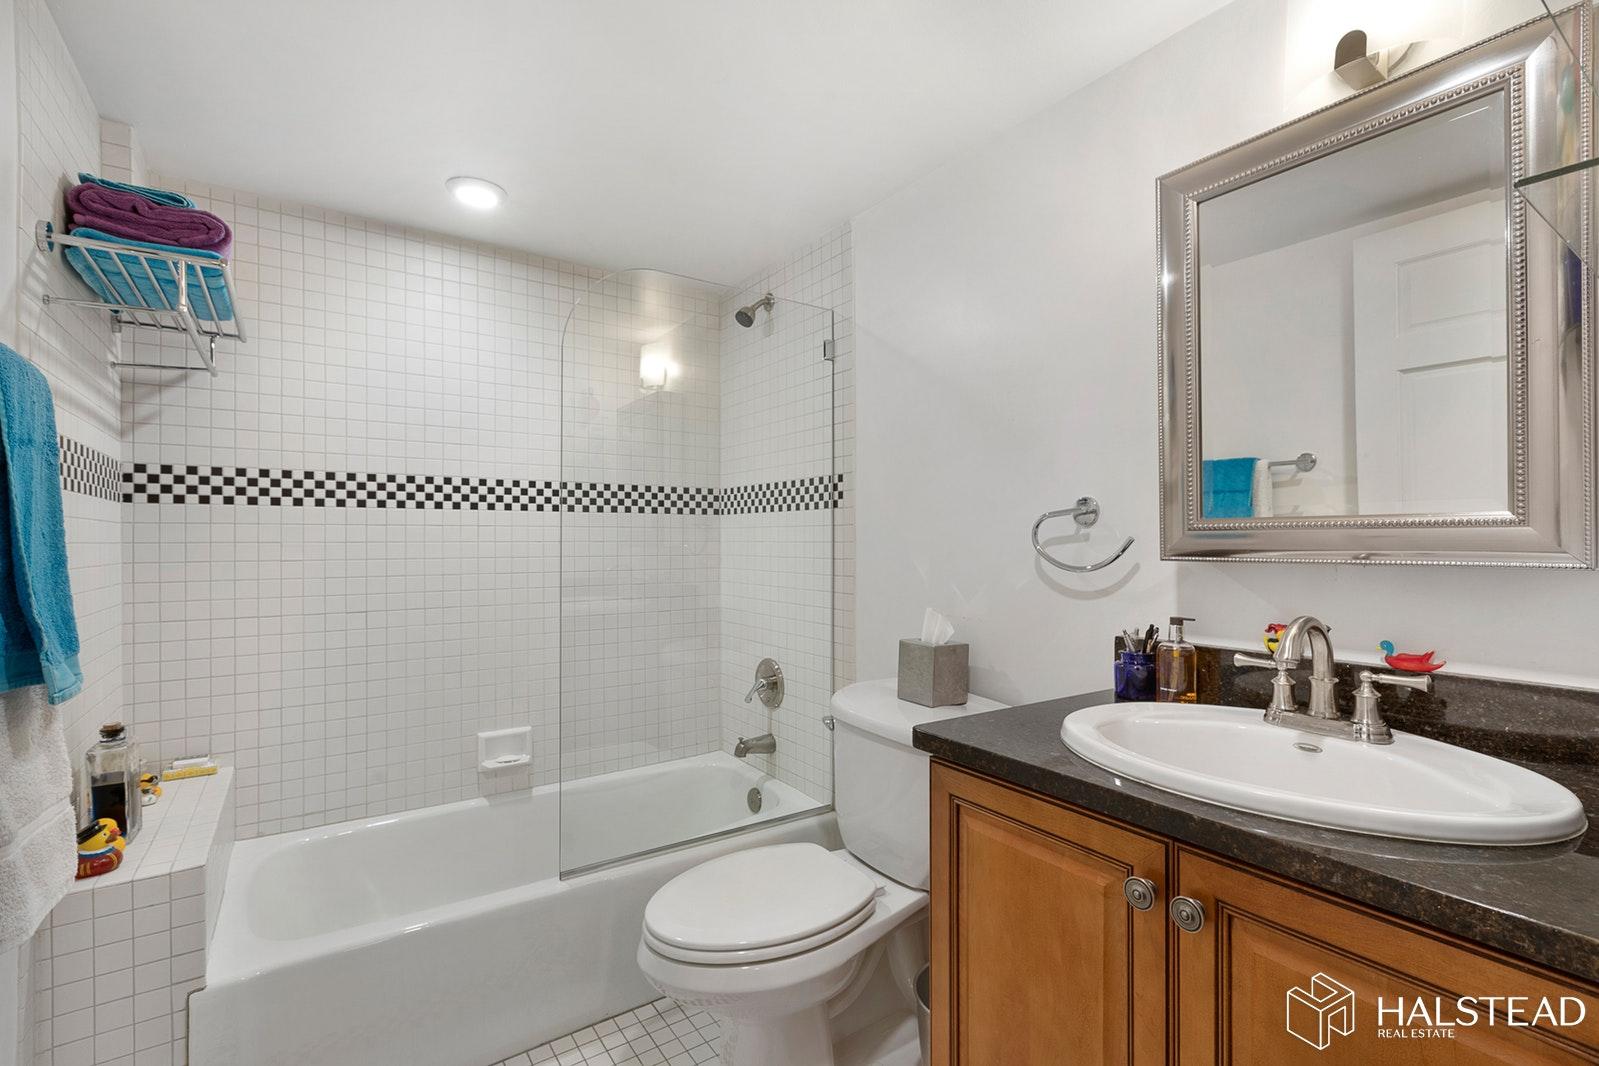 205 10TH ST 3A, Jersey City Downtown, $849,000, Web #: 19637270